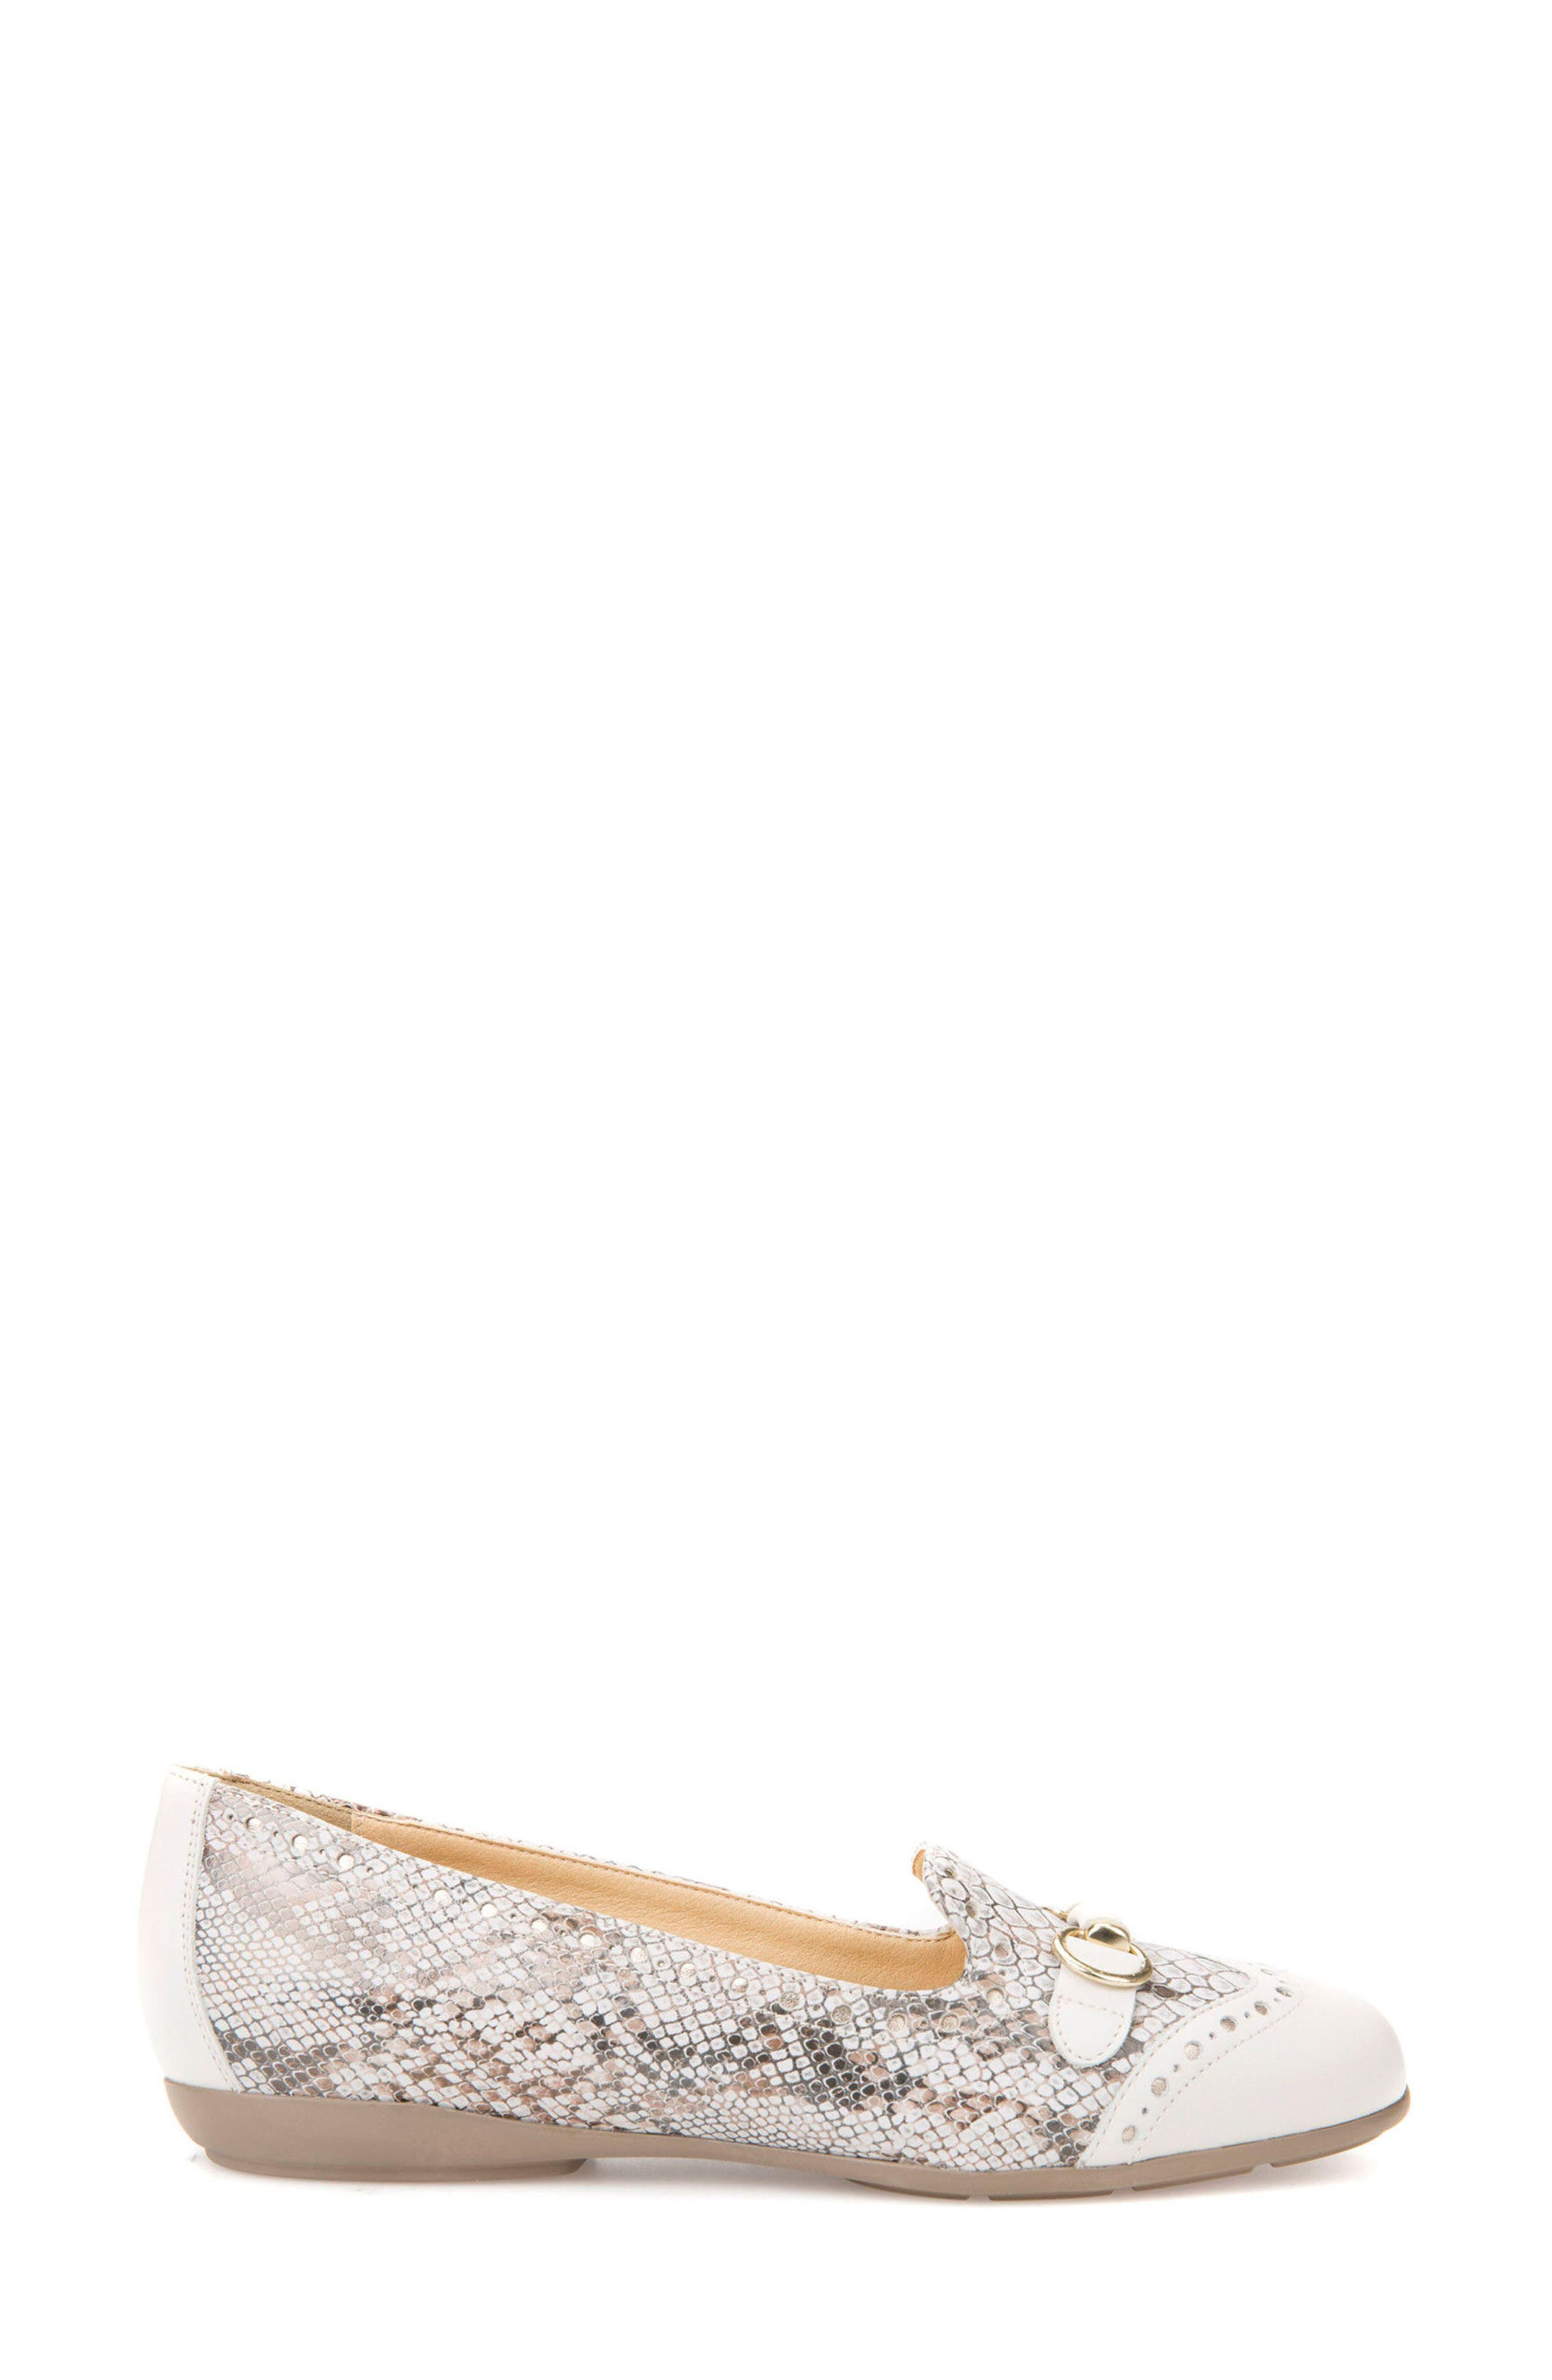 Annytah Loafer,                             Alternate thumbnail 3, color,                             Off White Leather